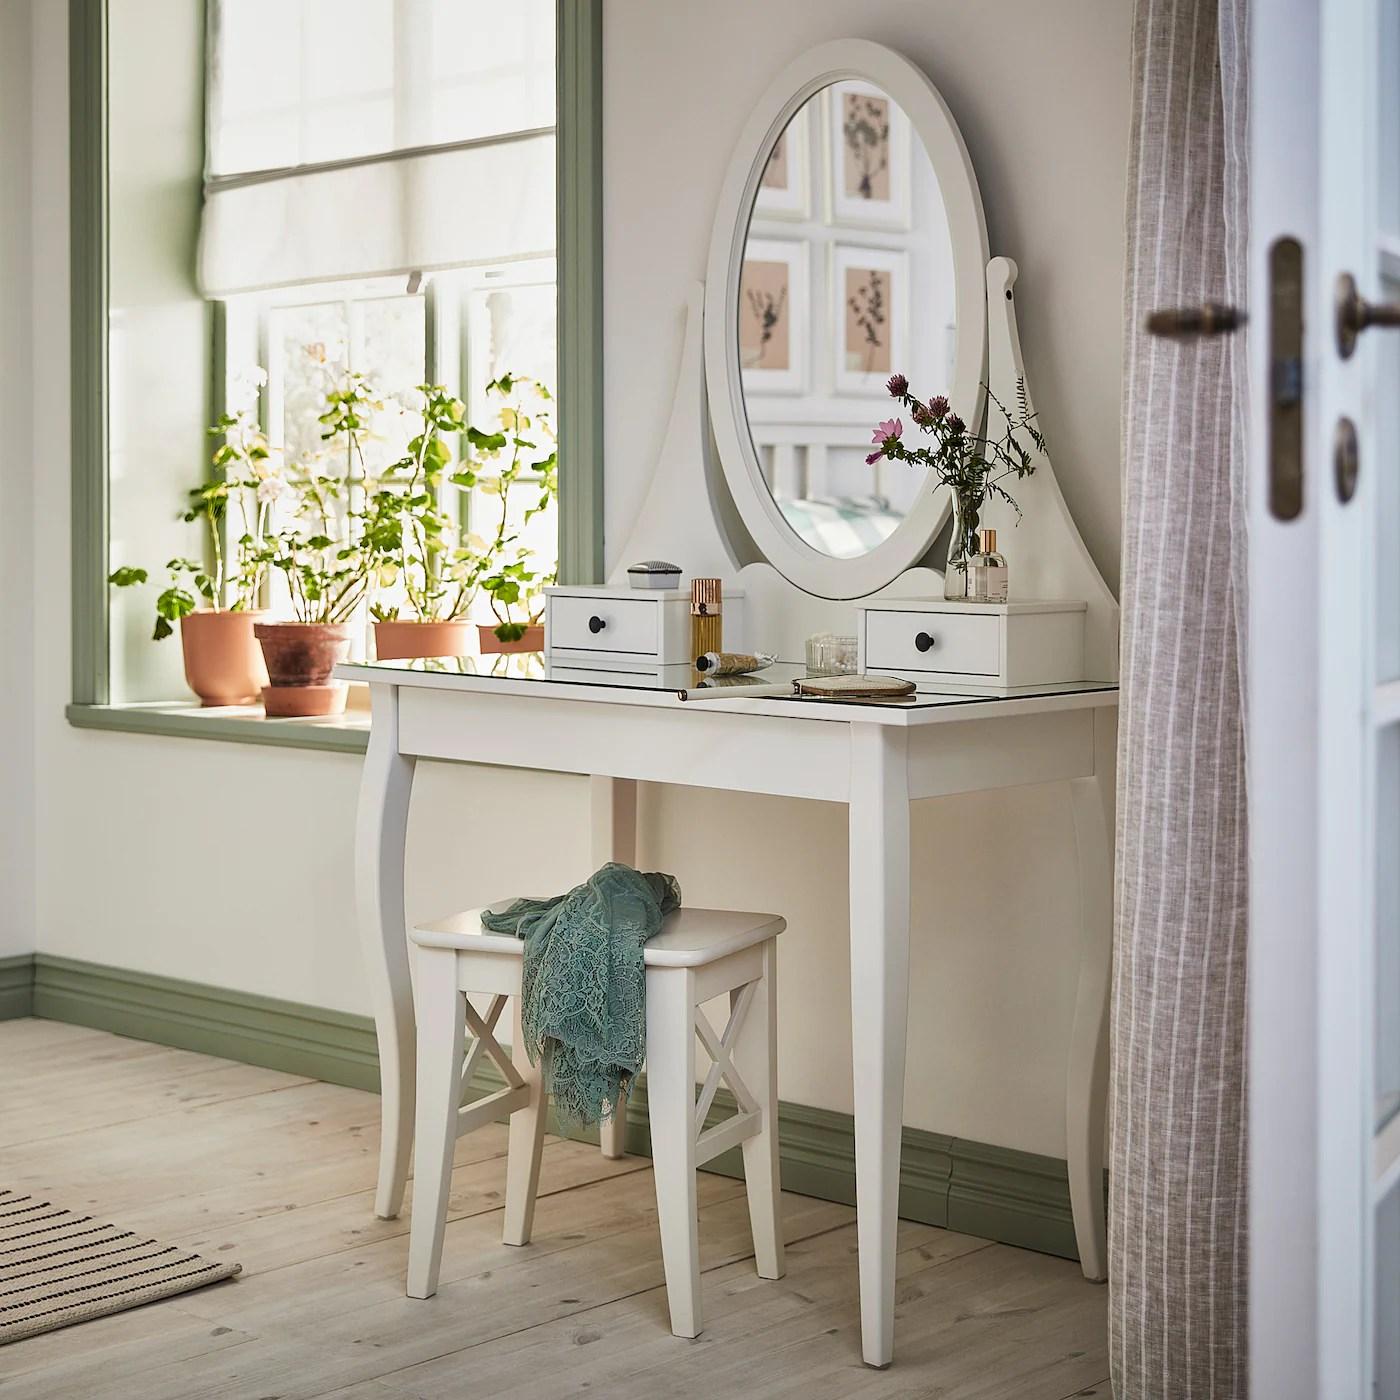 Hemnes Coiffeuse Avec Miroir Blanc 100x50 Cm Ikea